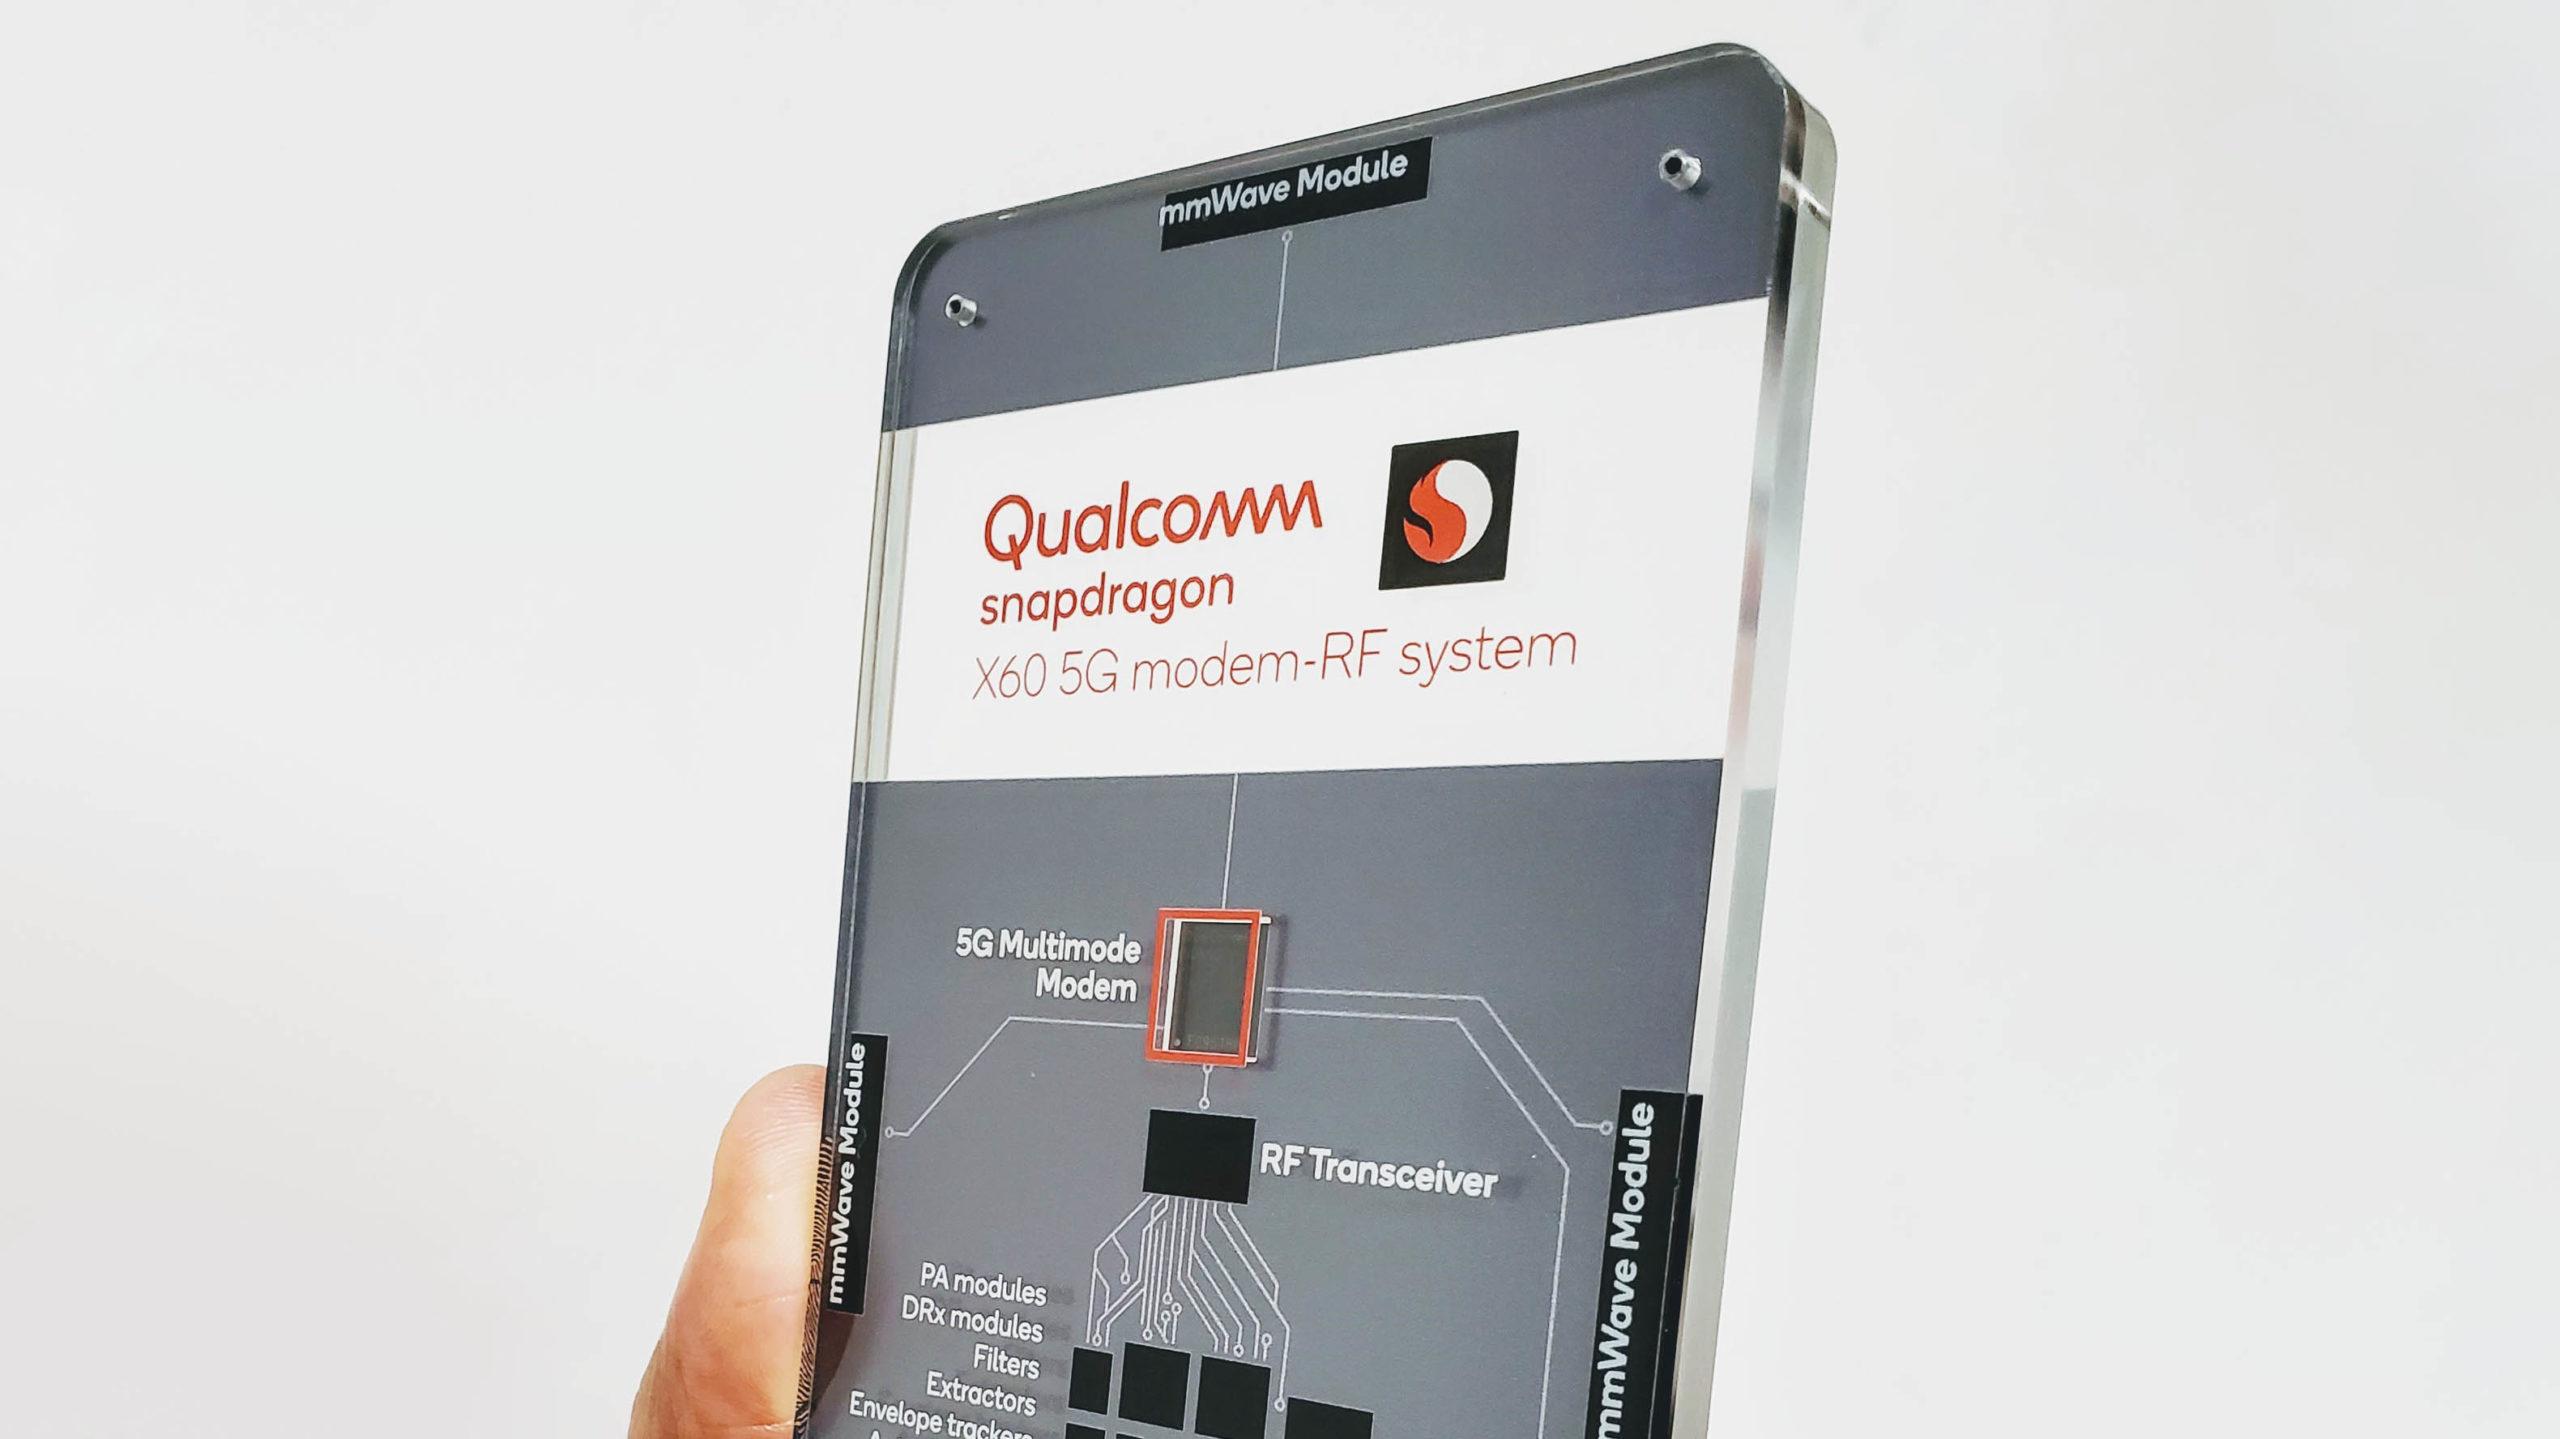 Qualcomm Snapdragon X60 Modem-RF system